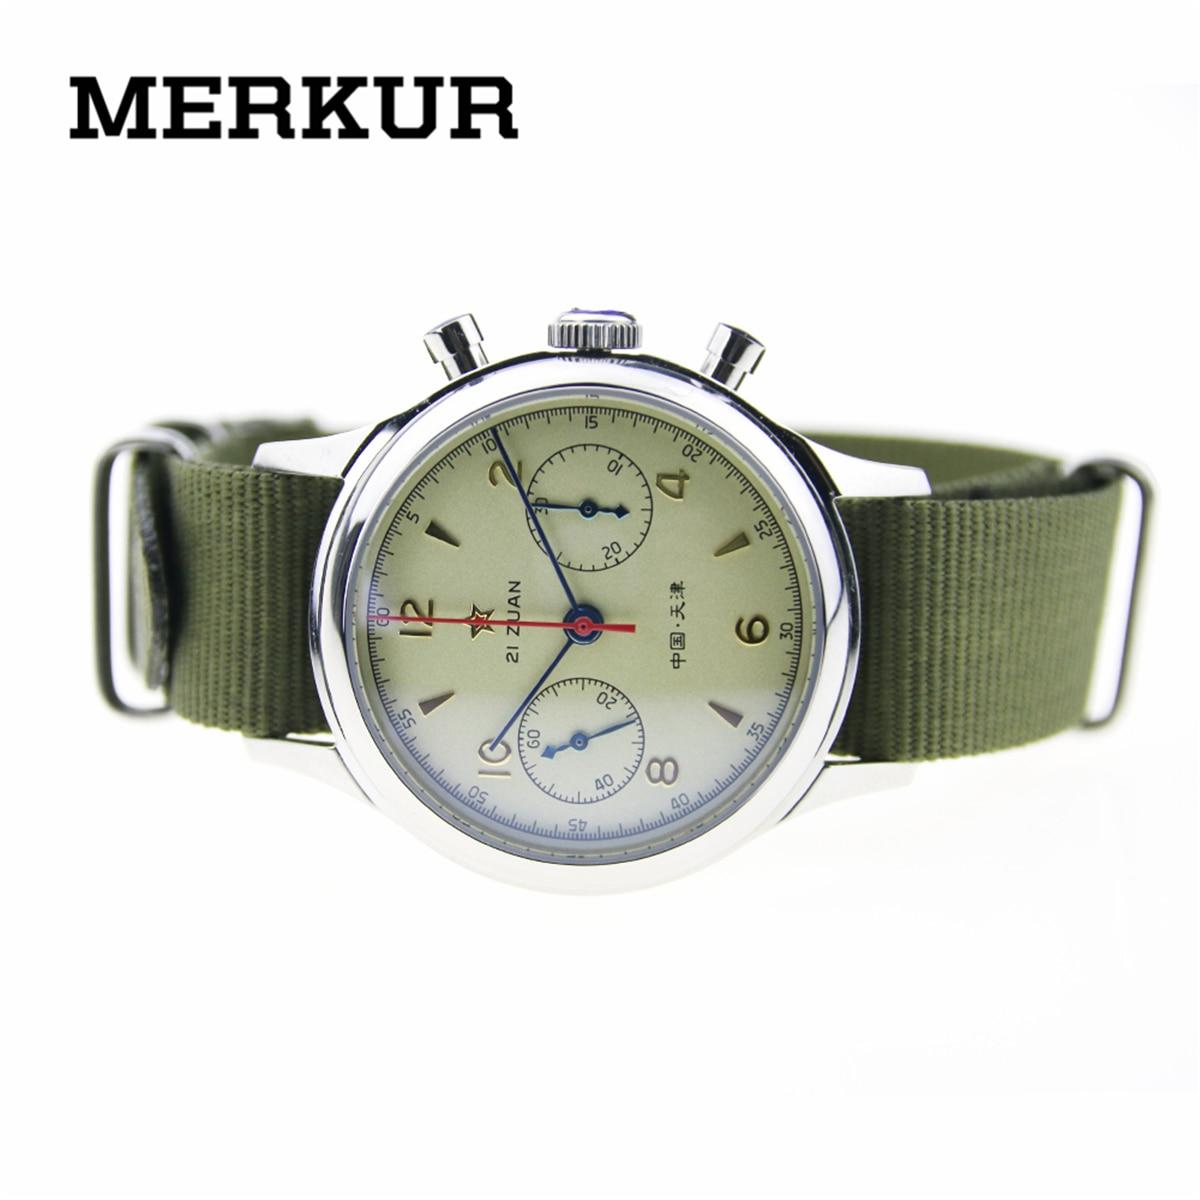 Movimiento de gaviota cronógrafo mecánico reloj de pulsera para hombre piloto offidorl reission 304 St19 1963 funda trasera de exibición